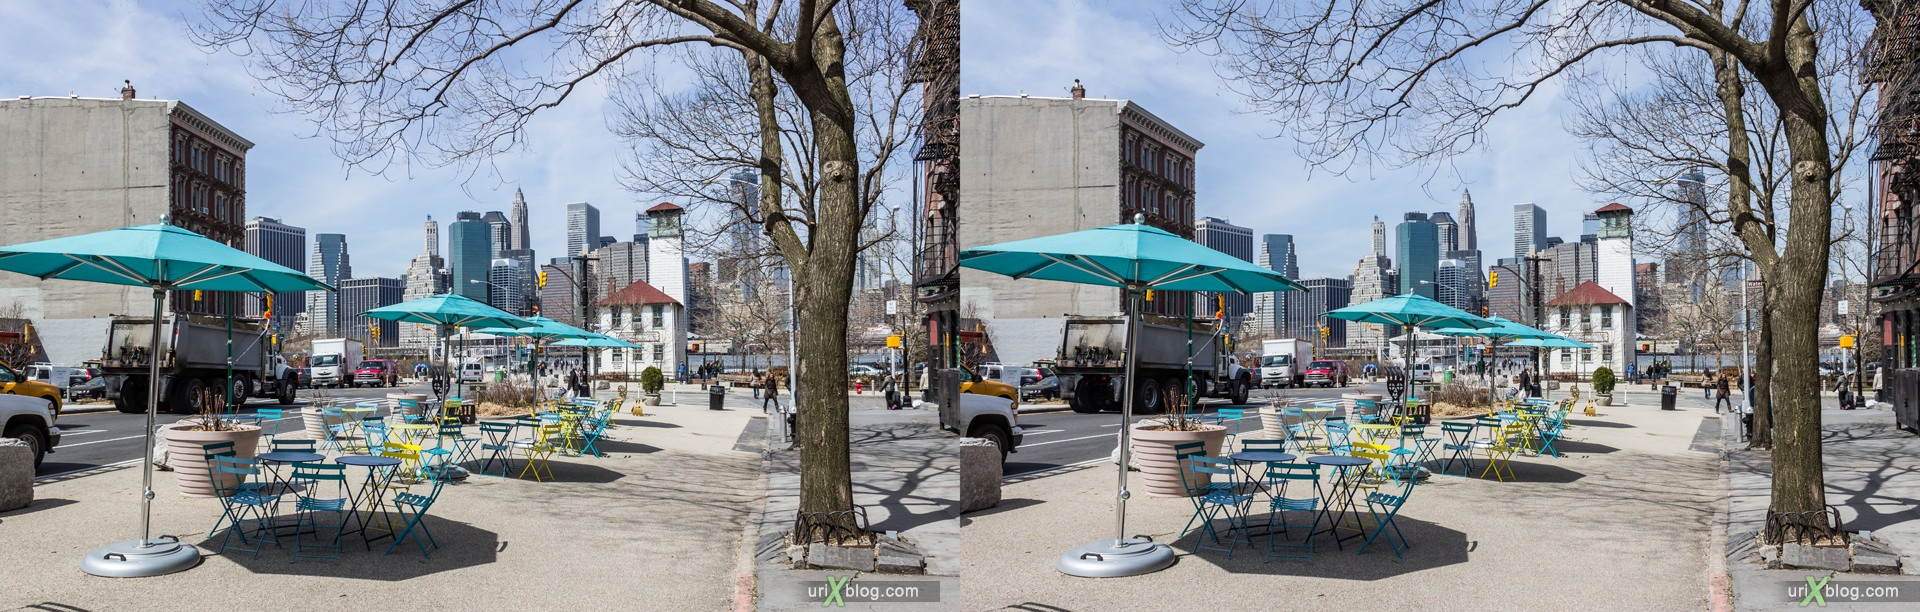 2013, Old Fulton улица, Бруклин, Нью-Йорк, США, 3D, перекрёстные стереопары, стерео, стереопара, стереопары